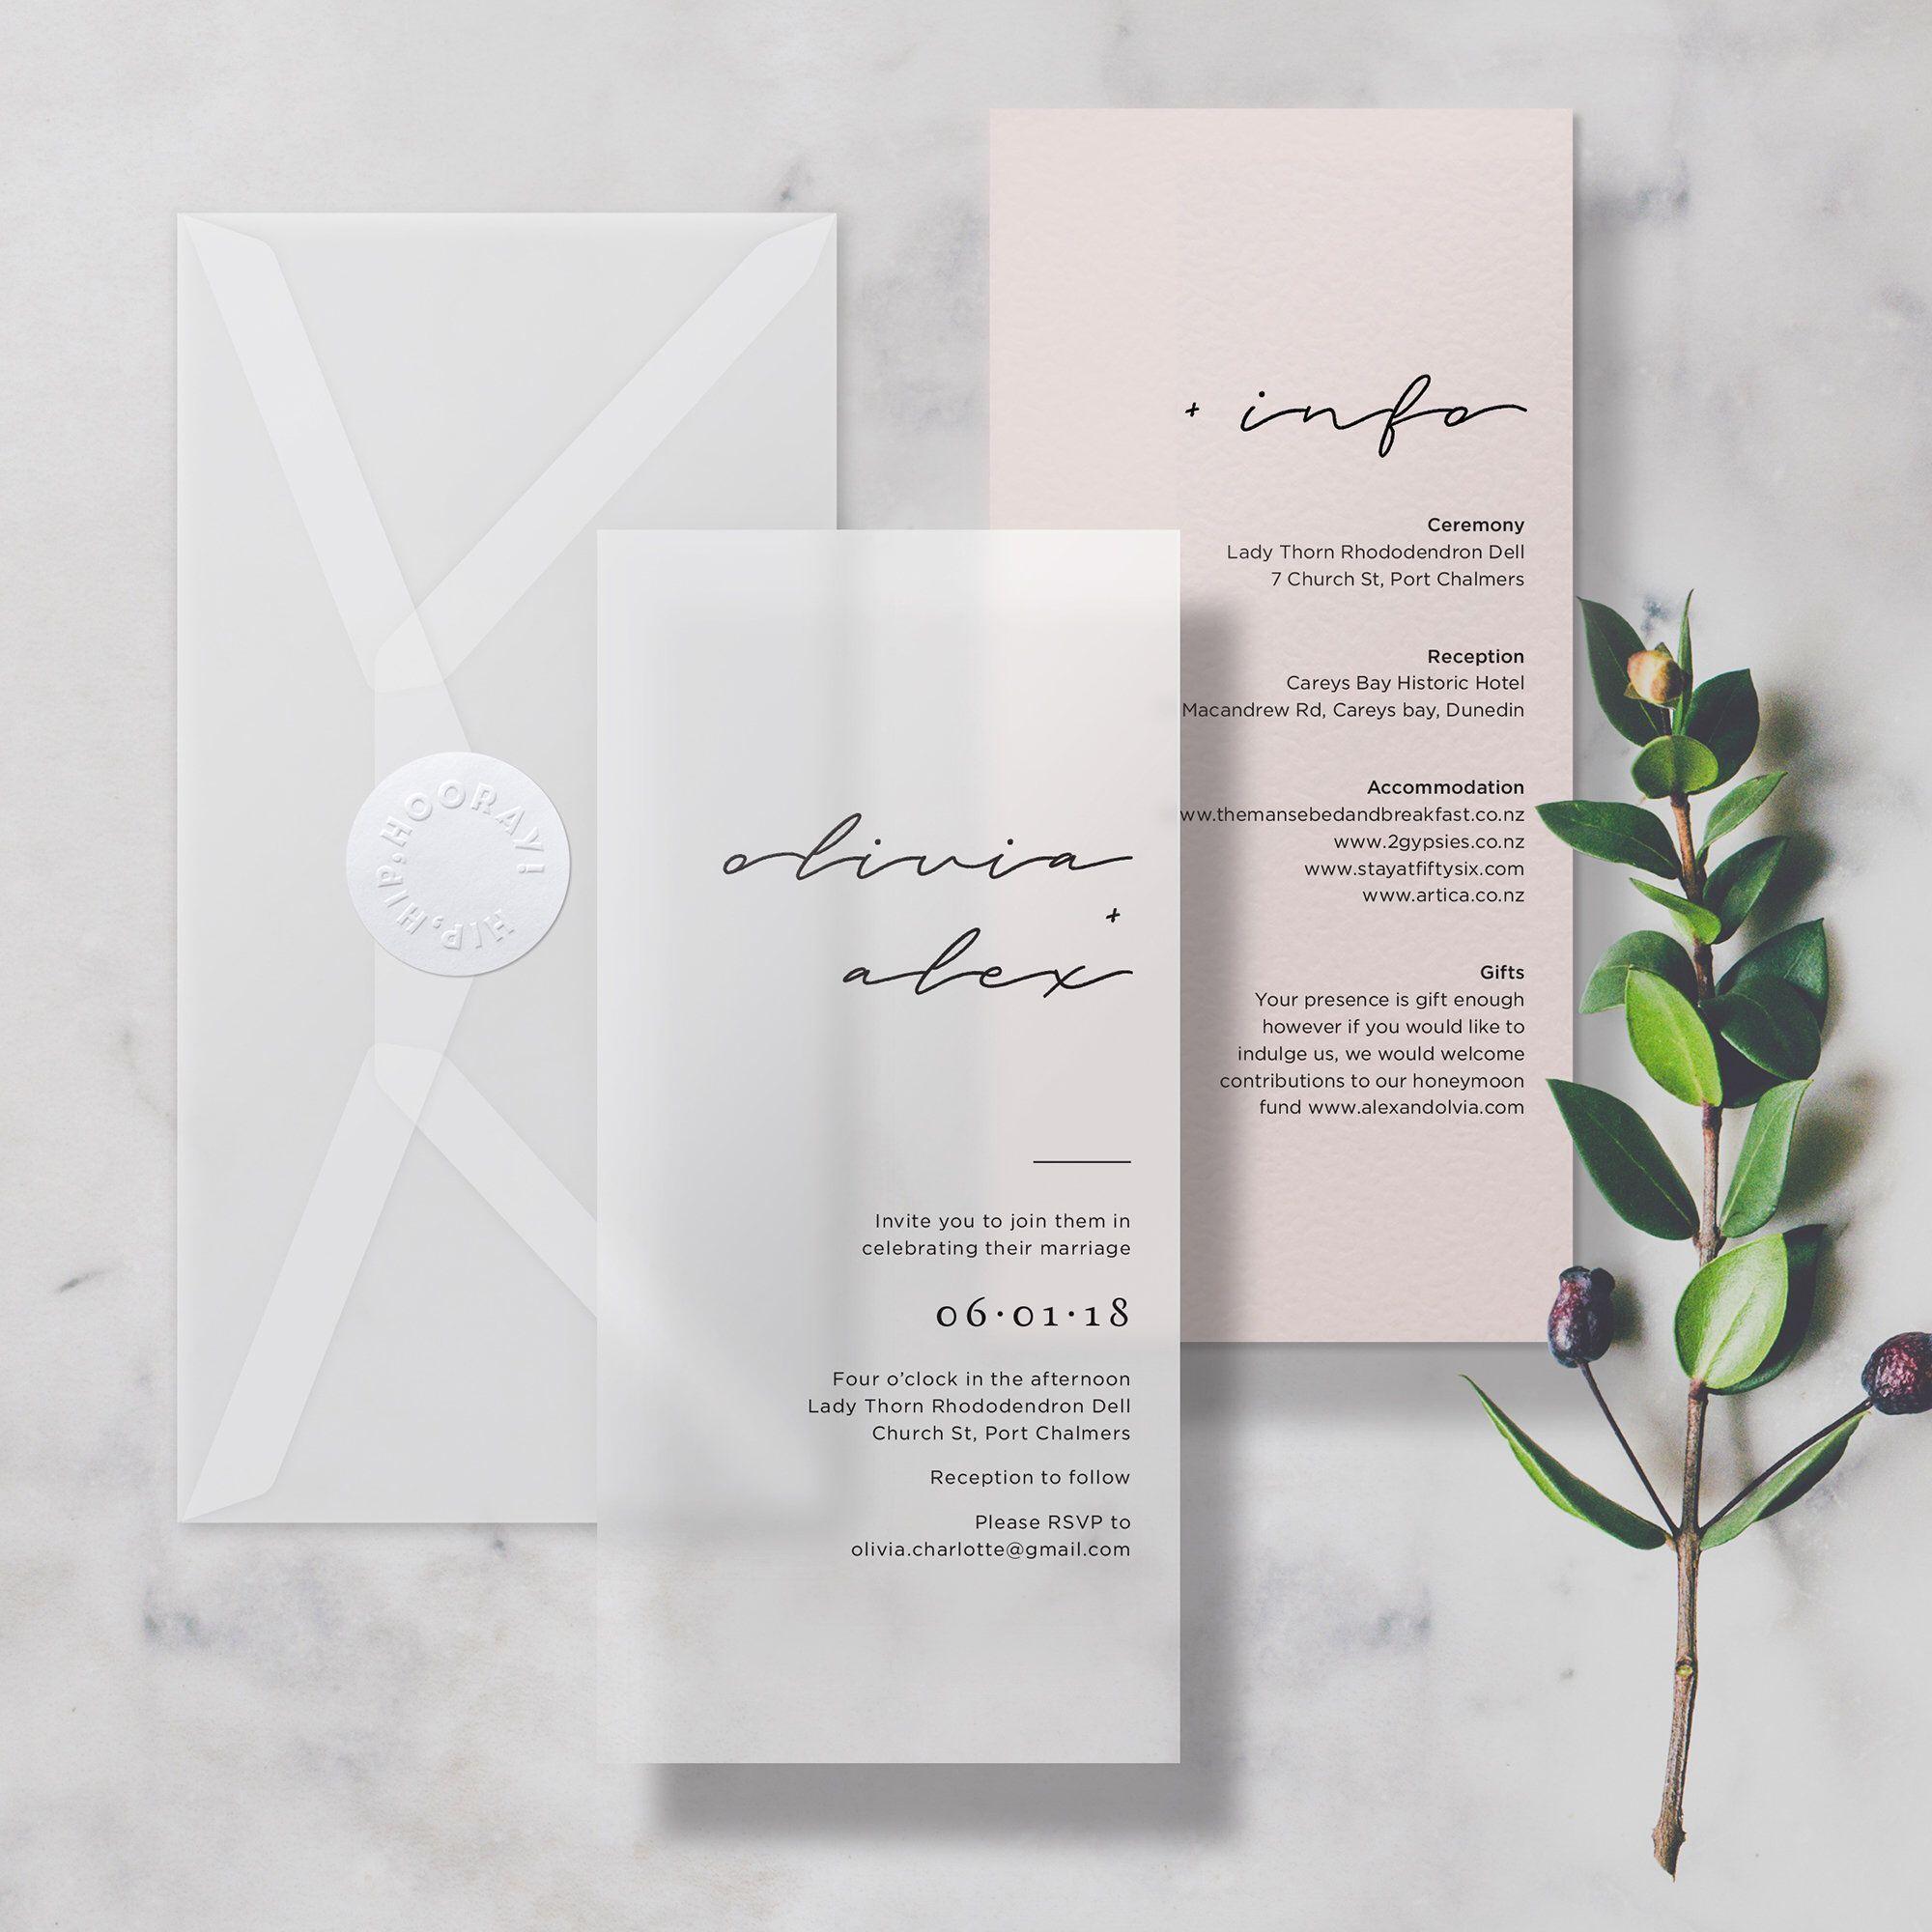 17 DIY Vellum Wedding Invitation Ideas You Can Do